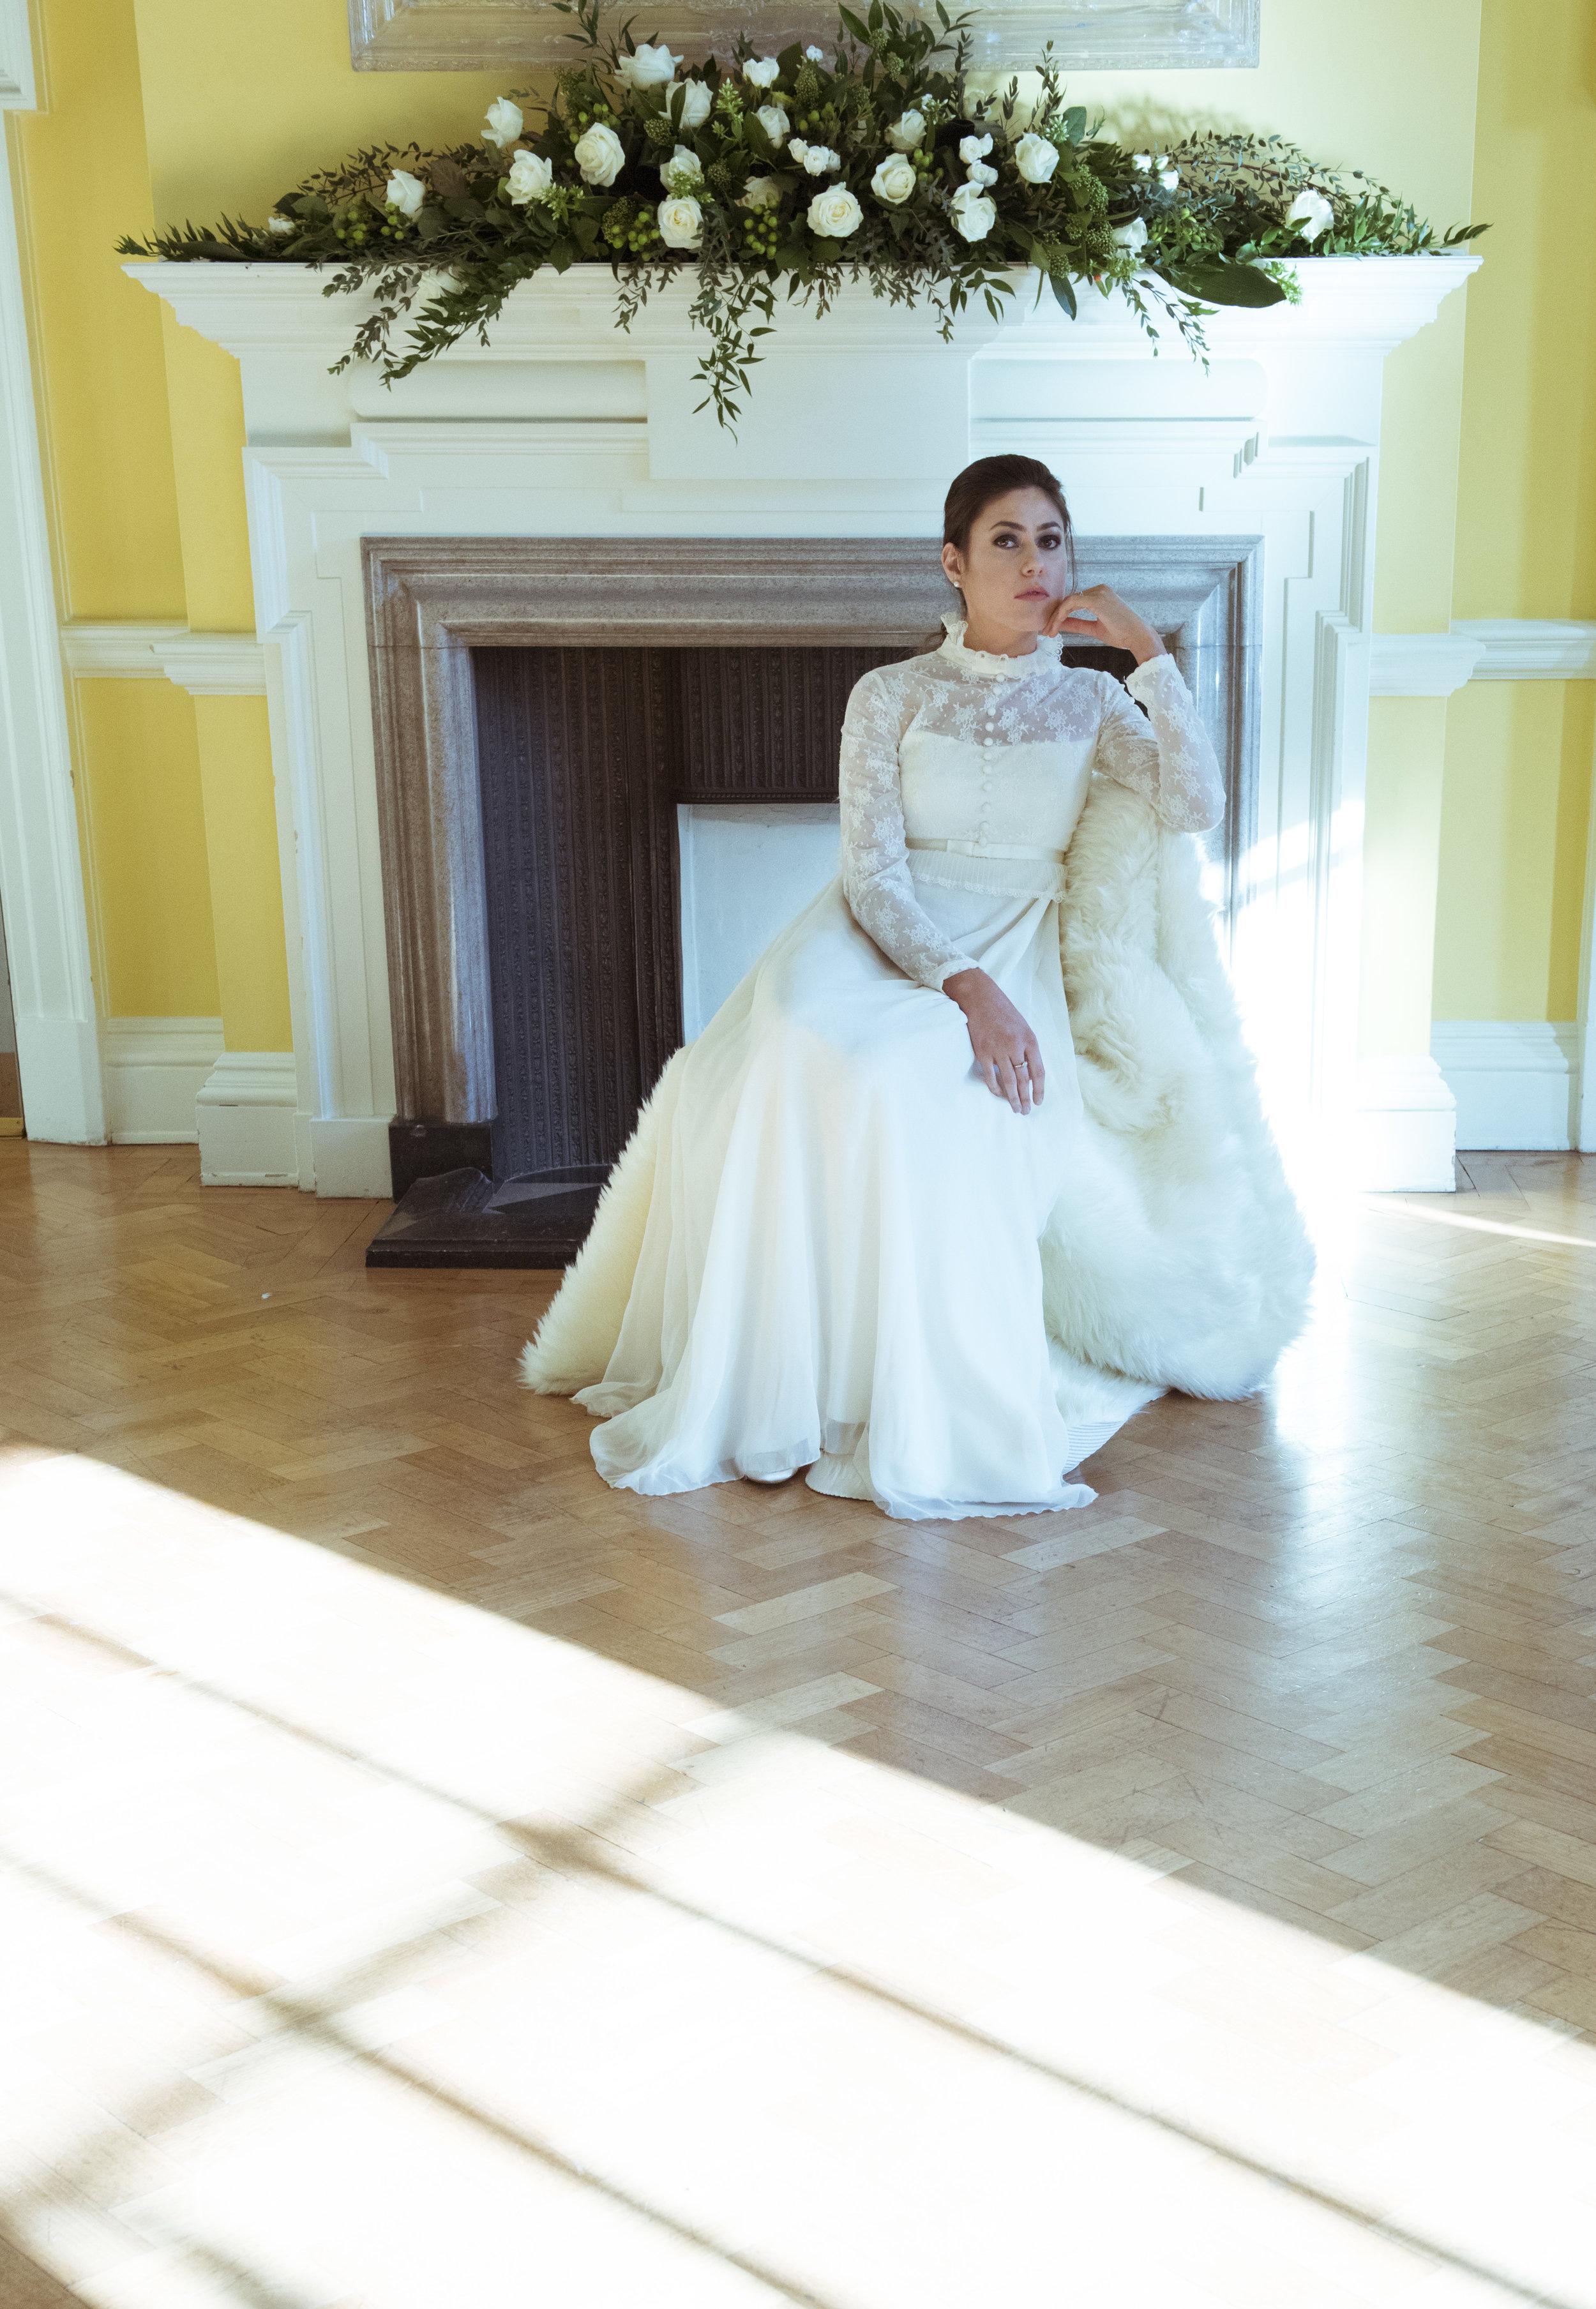 KERRY_CURL_ALEX_HILL_OPEN_NORWICH_WEDDING_SHOOT_NOV_2017-6842.jpg